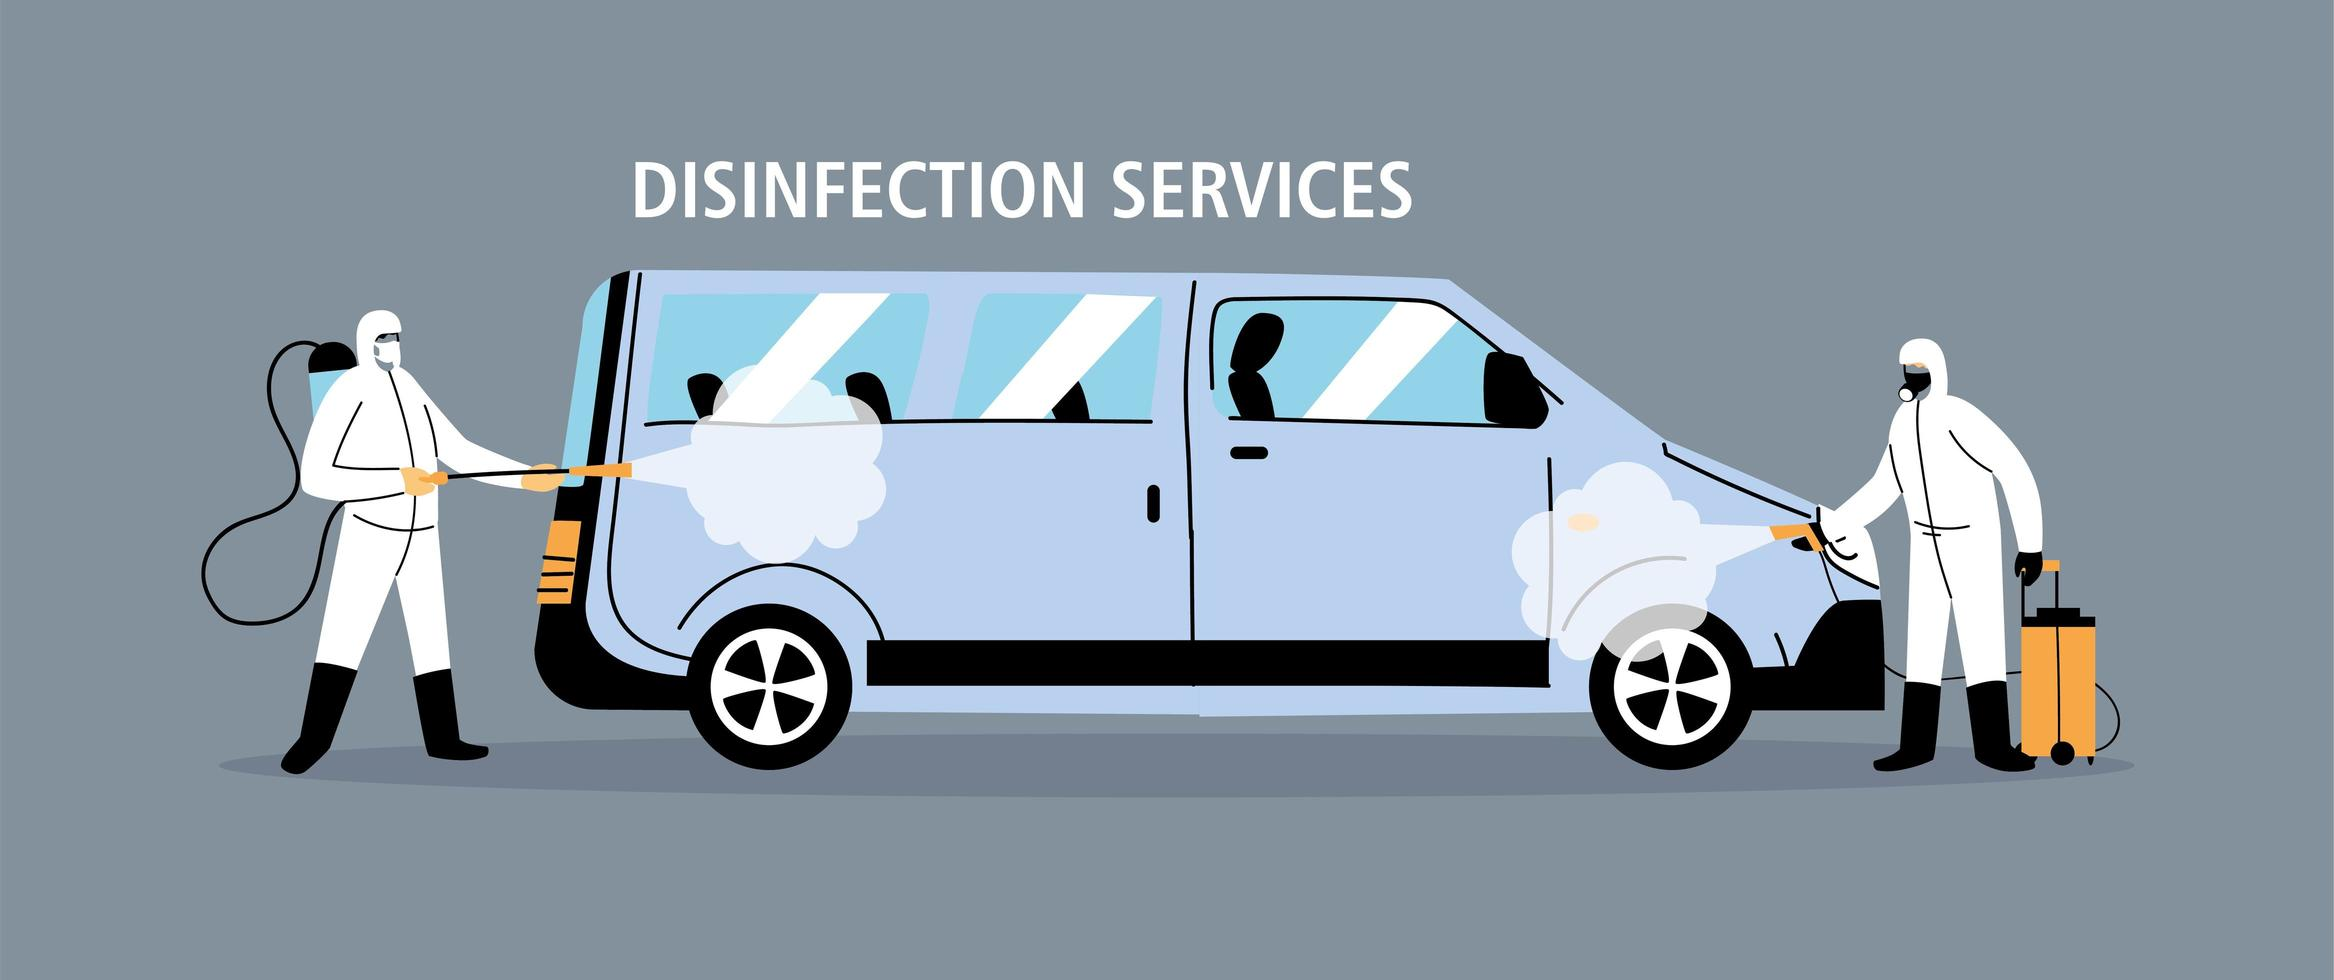 service desinfektion med coronavirus eller covid 19 vektor